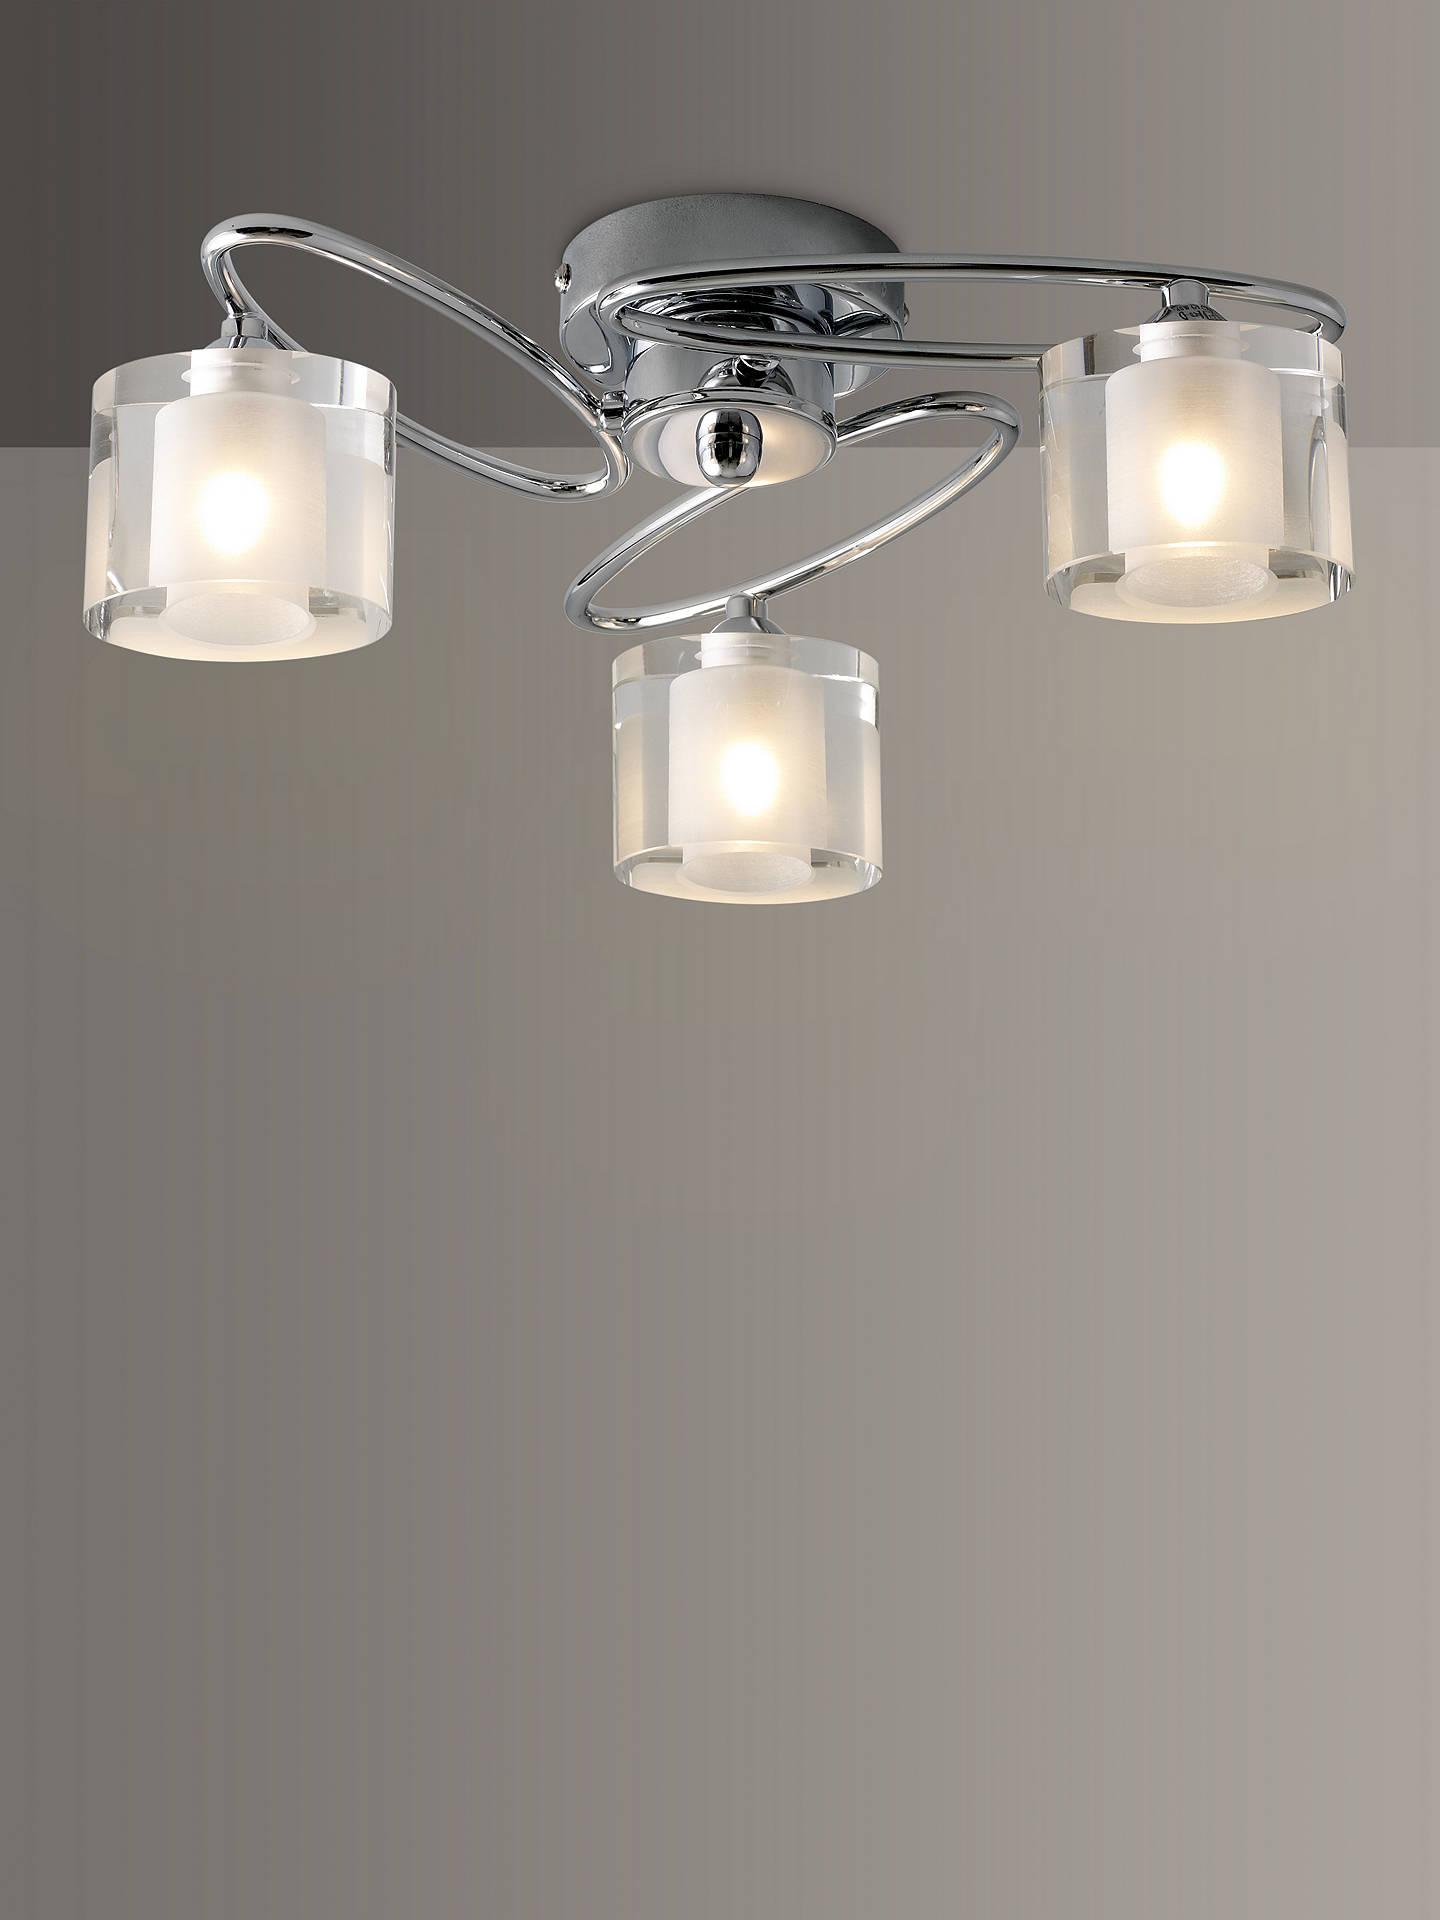 Buy john lewis partners zola semi flush 3 arm ceiling light chrome online at